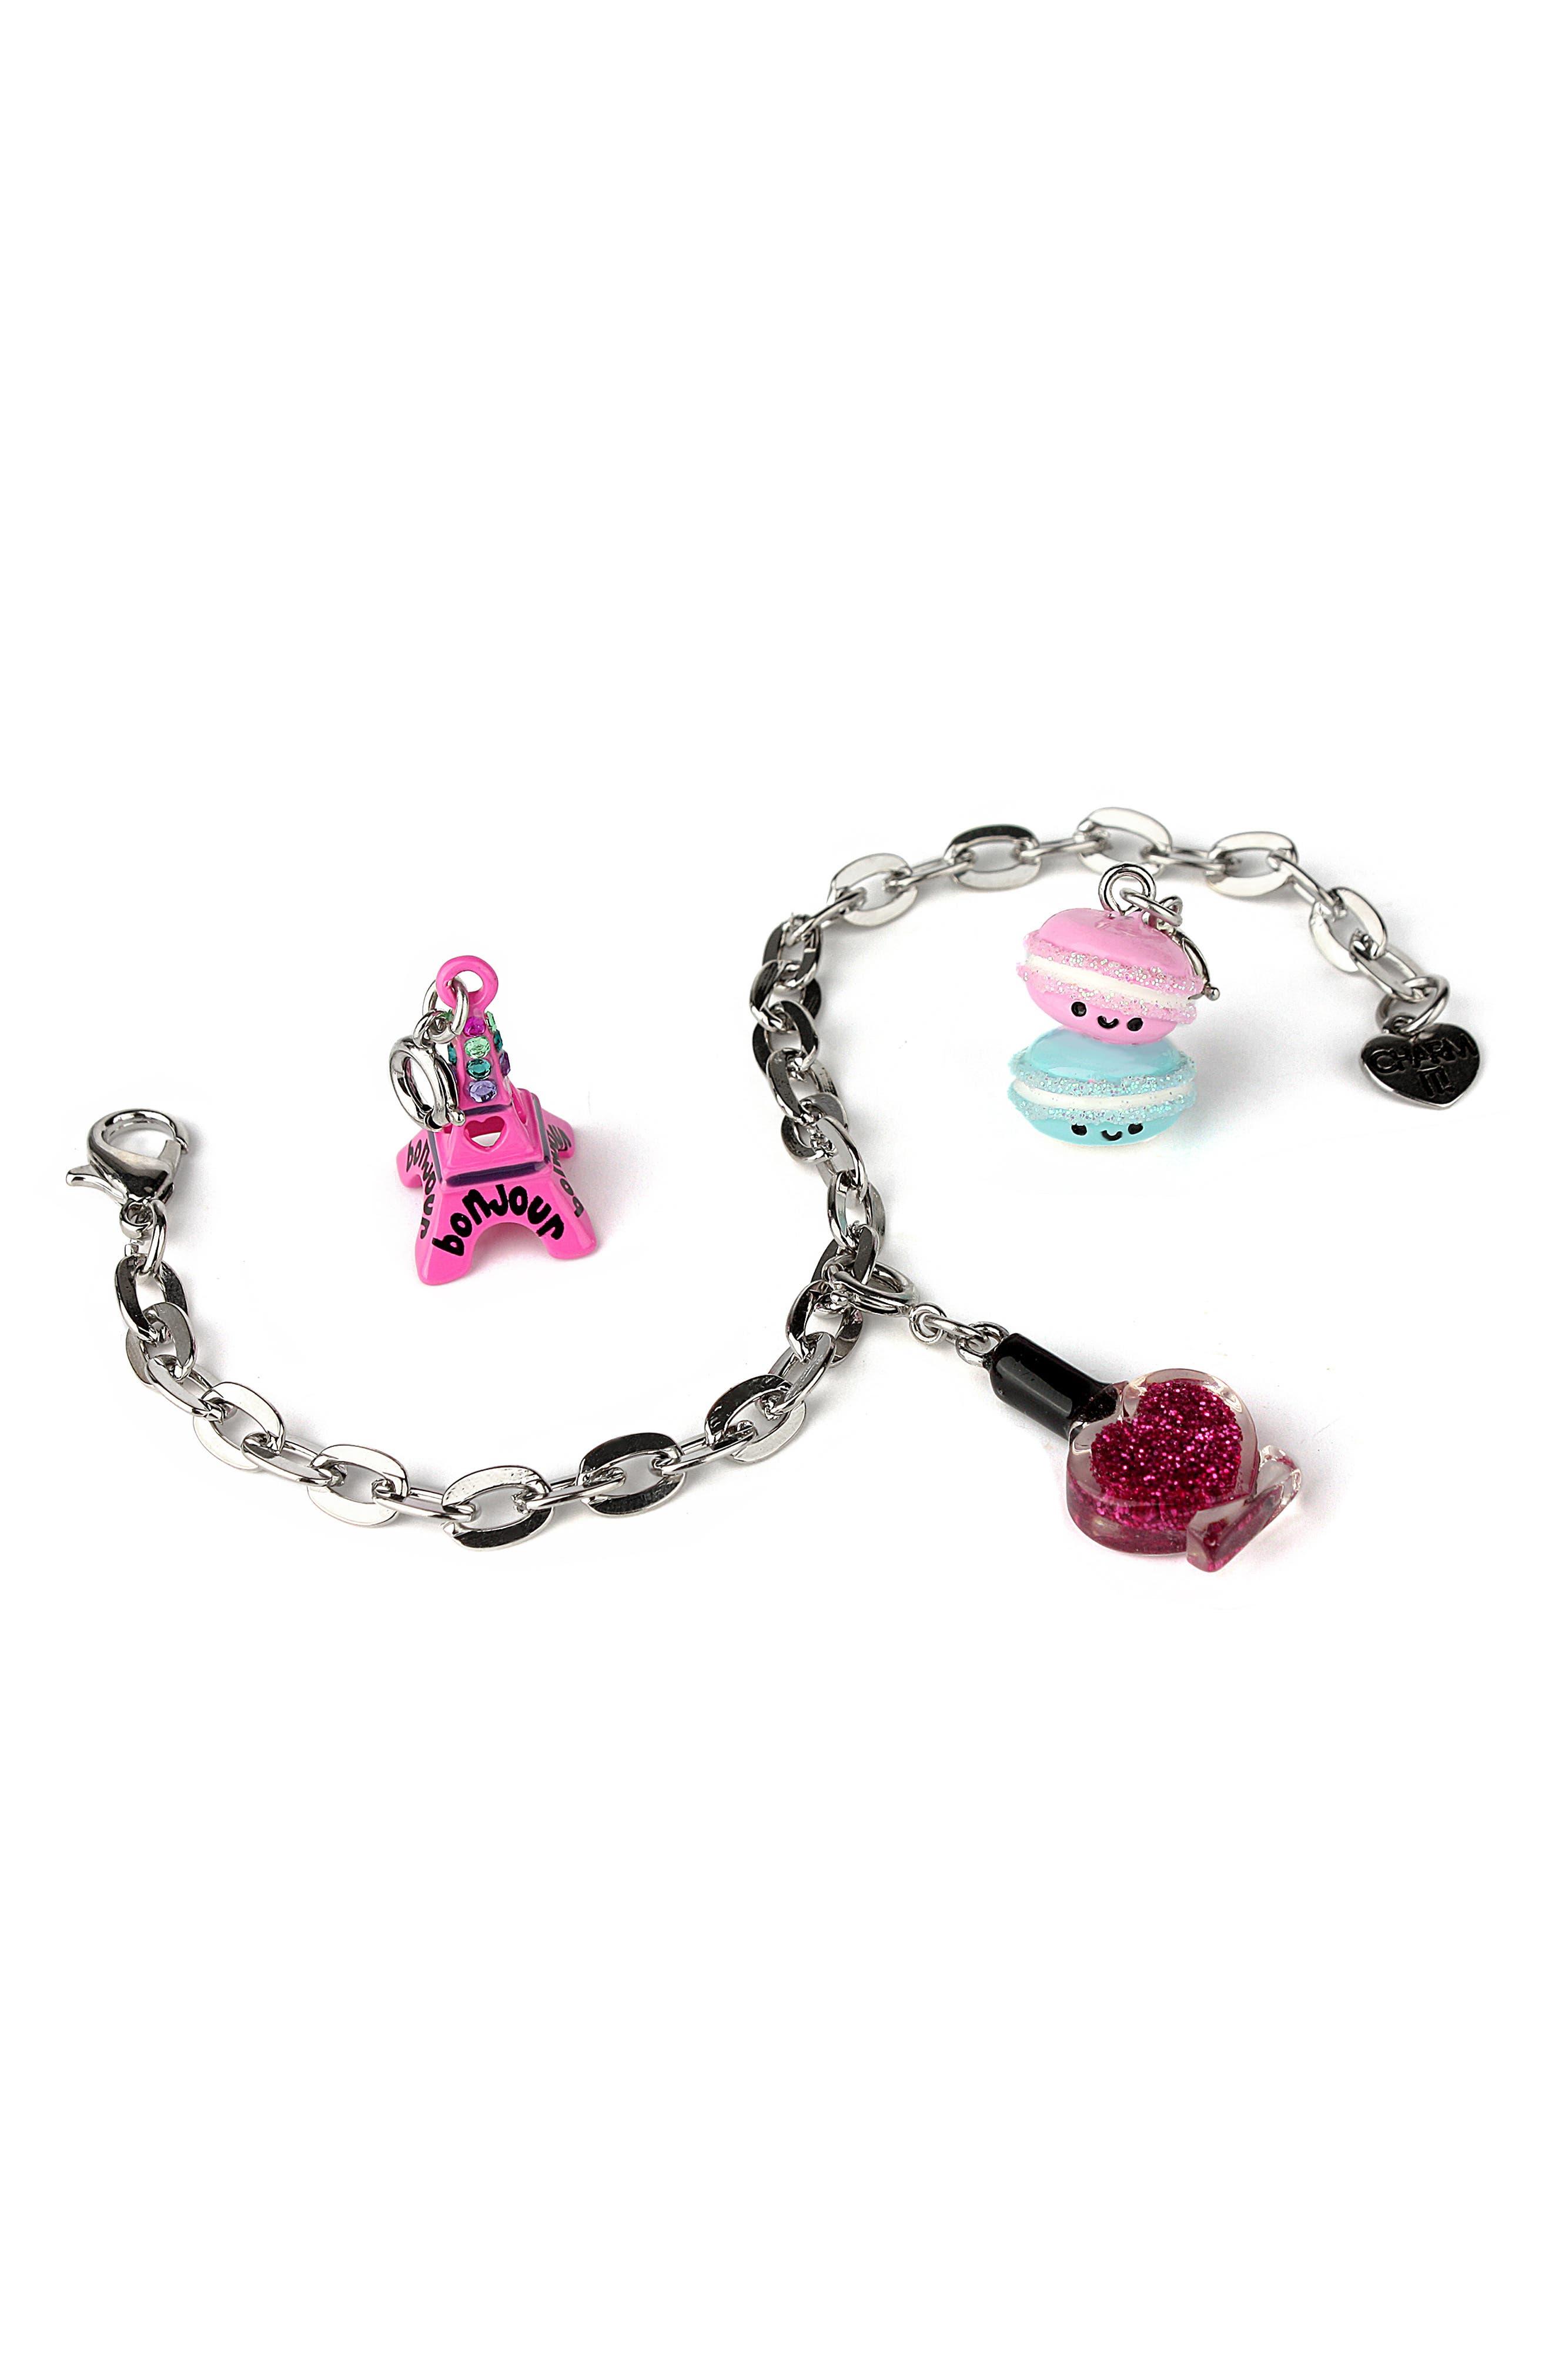 Parisian Charm Bracelet Gift Set,                             Alternate thumbnail 2, color,                             SILVER